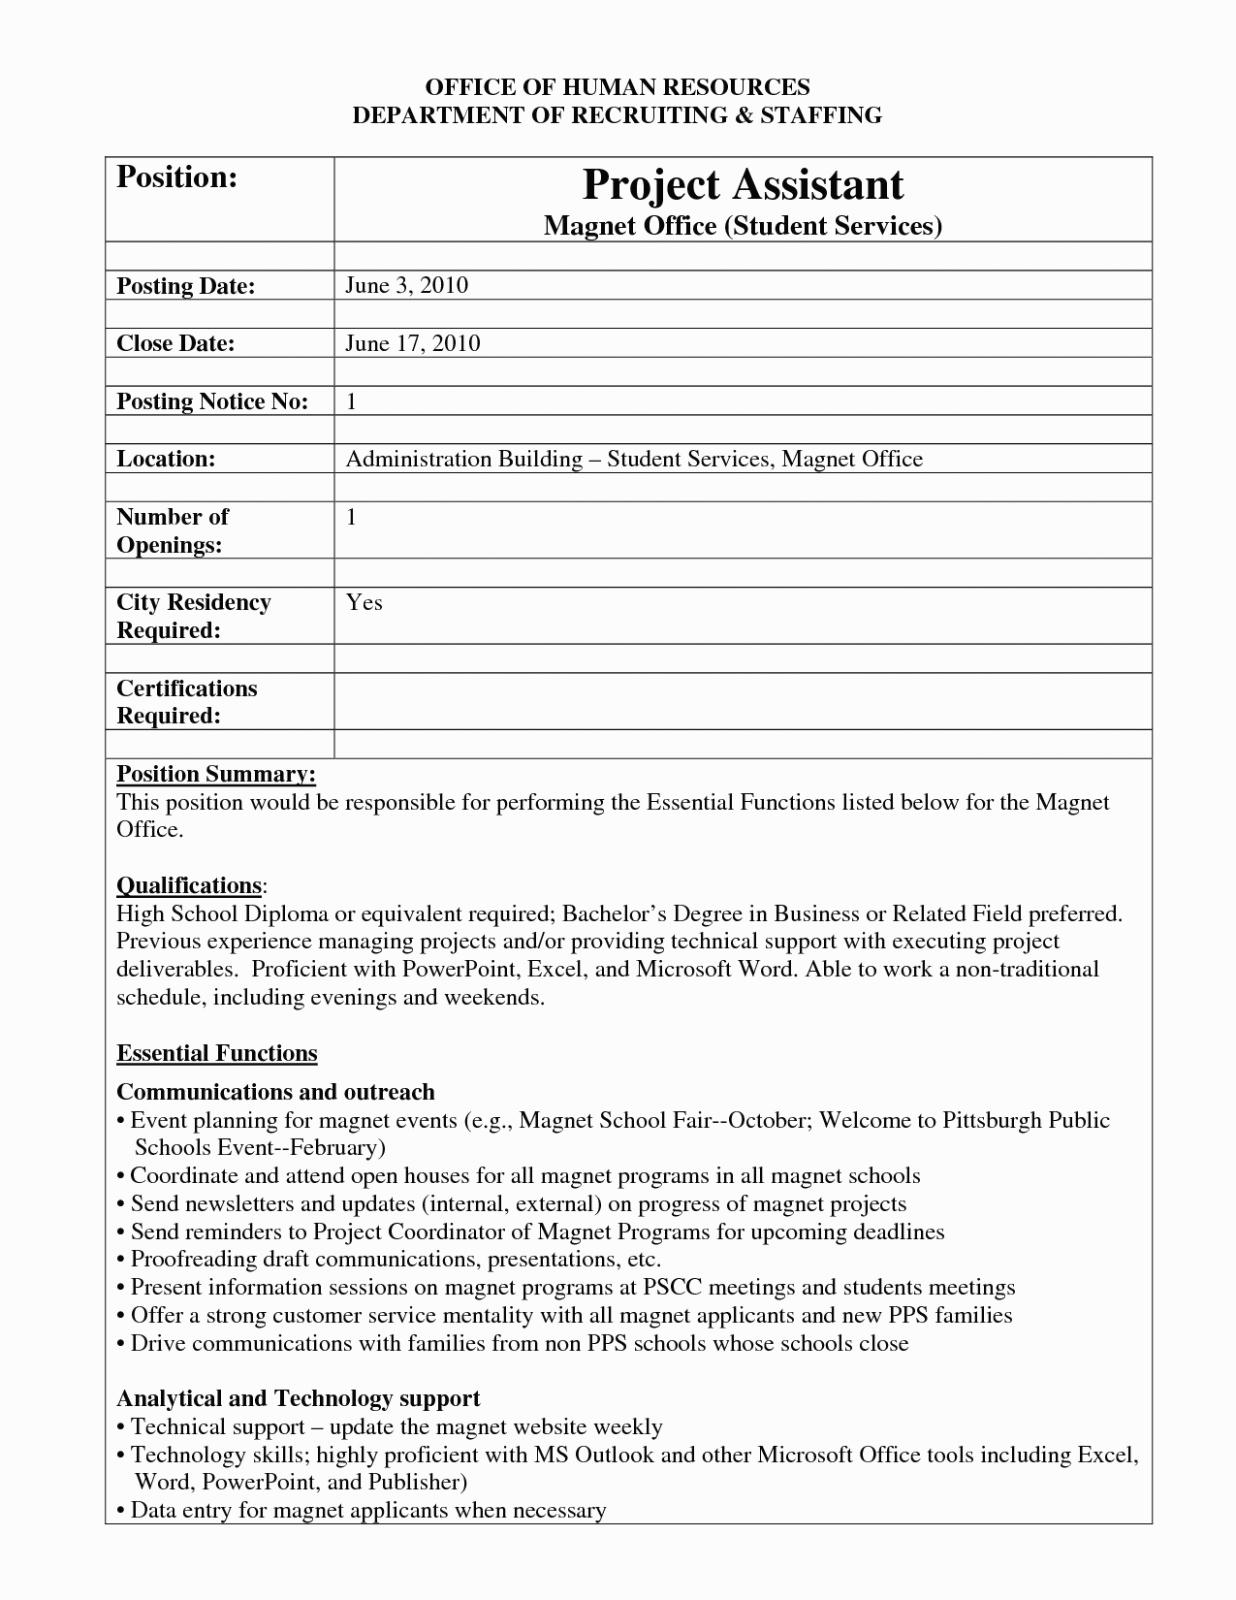 Internal Job Posting Template Word - Atlantaauctionco With Regard To Internal Job Posting Template Word